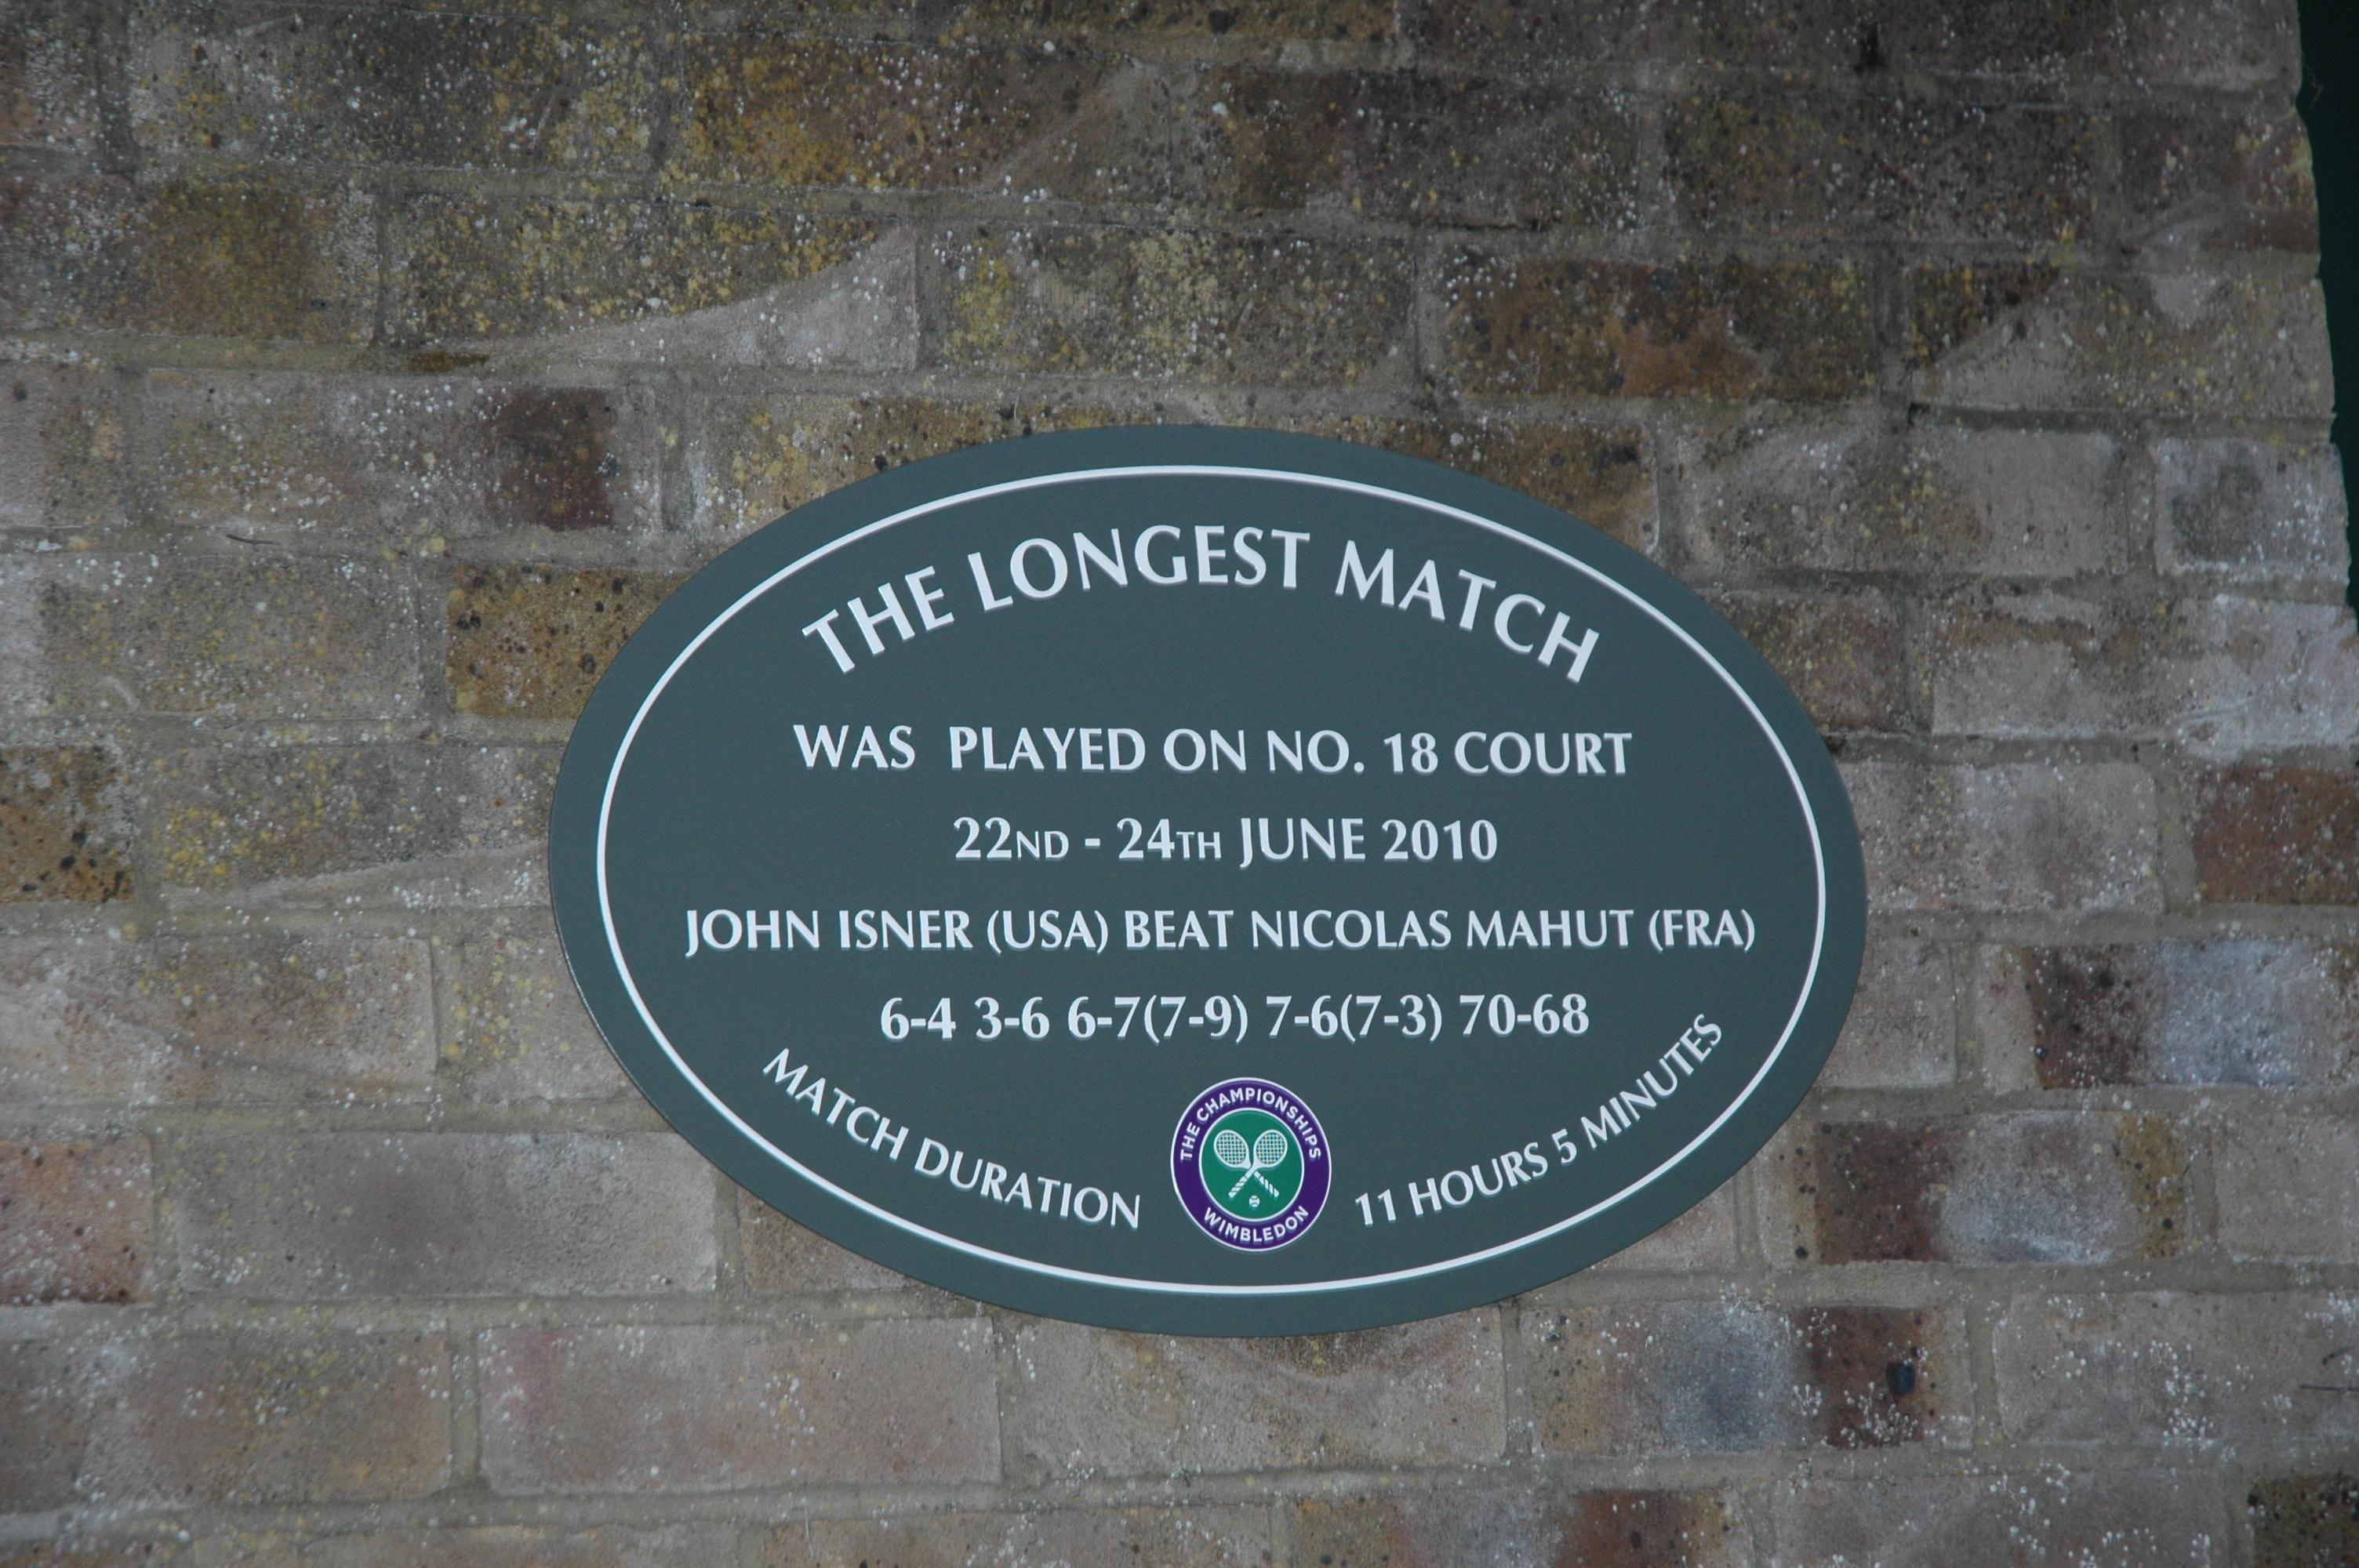 Wimbledon Madebygary